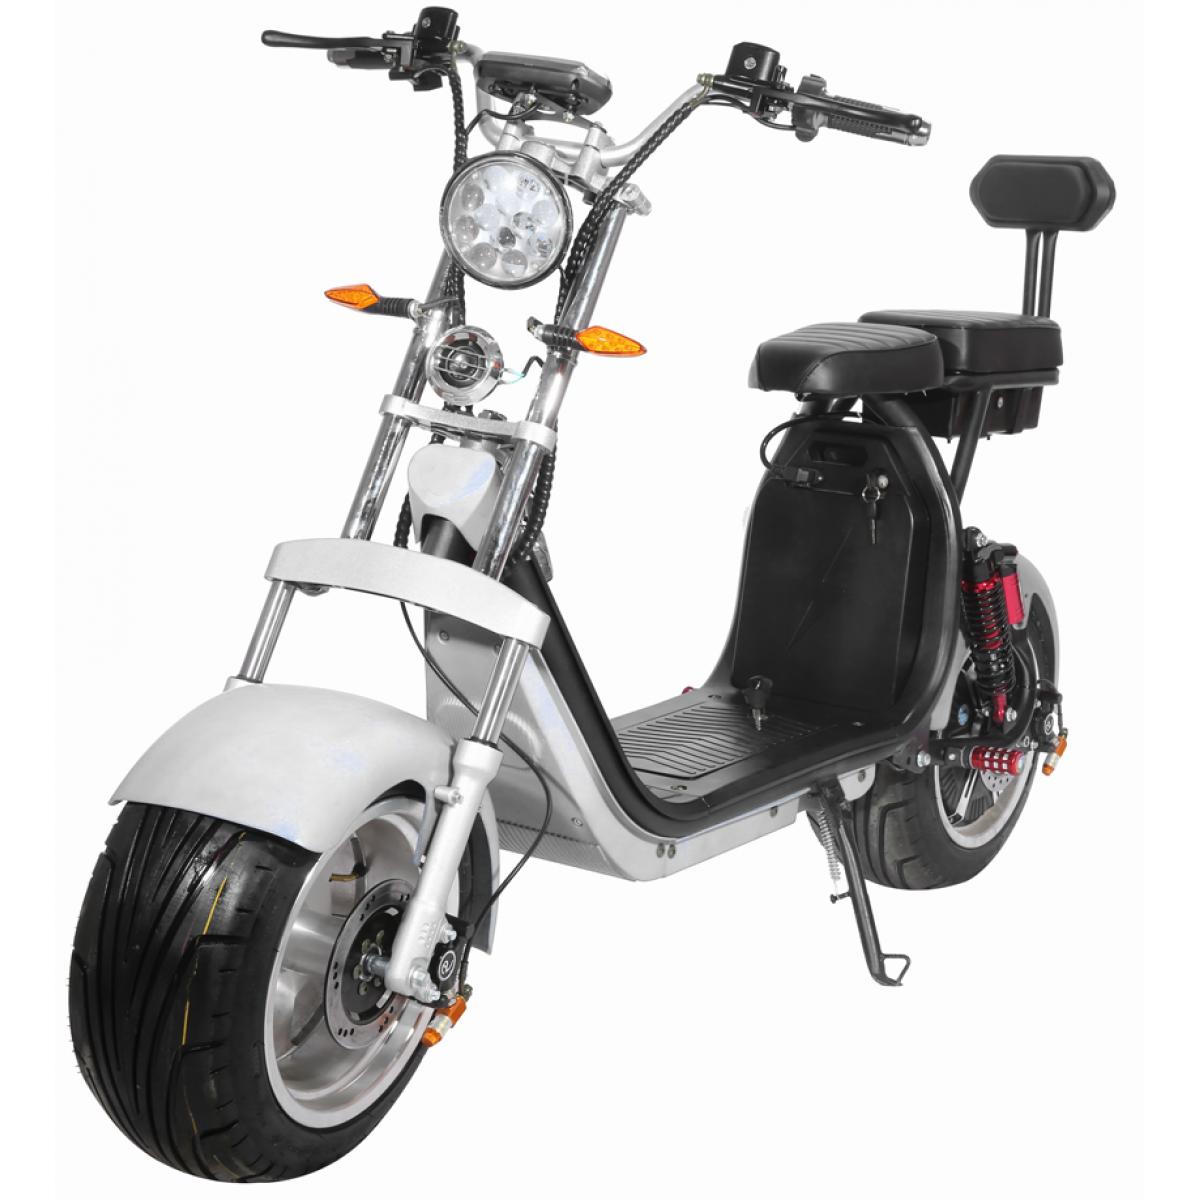 Moto Elétrica RideMode ECO 3000w, Aluminium, White, EM-03-BW